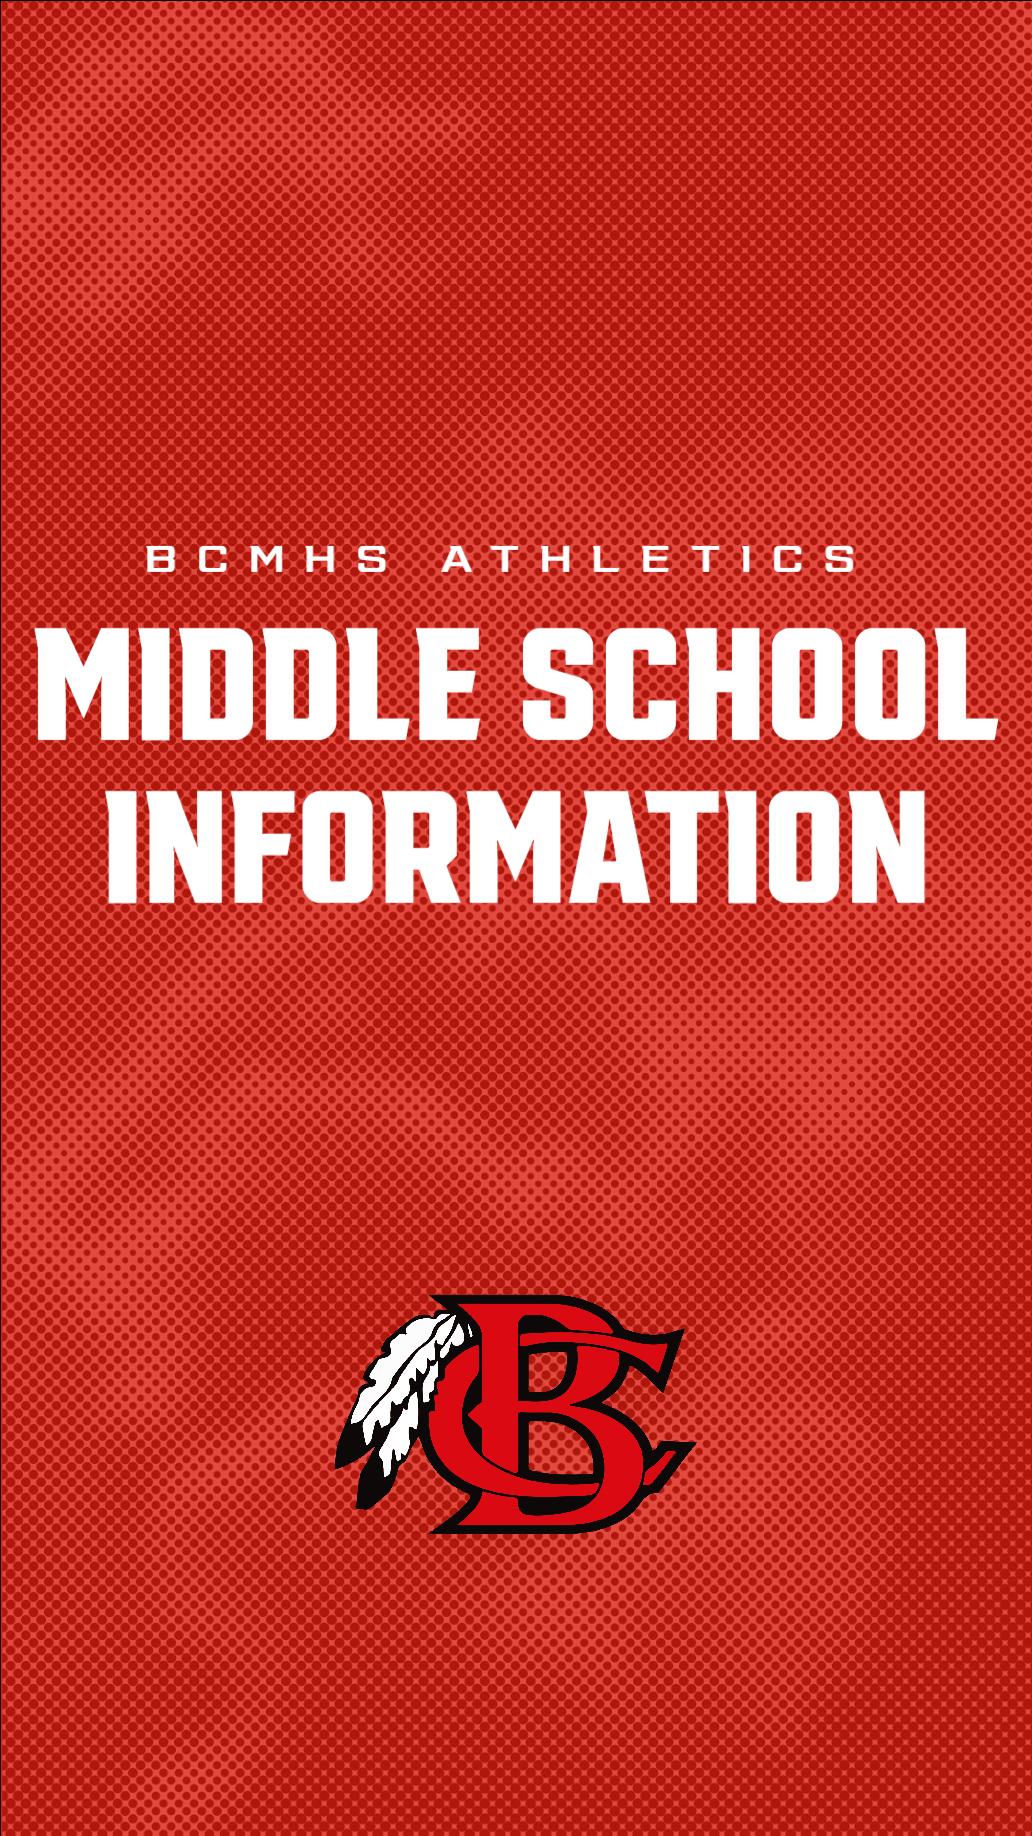 Middle School Athletic Information Side Banner